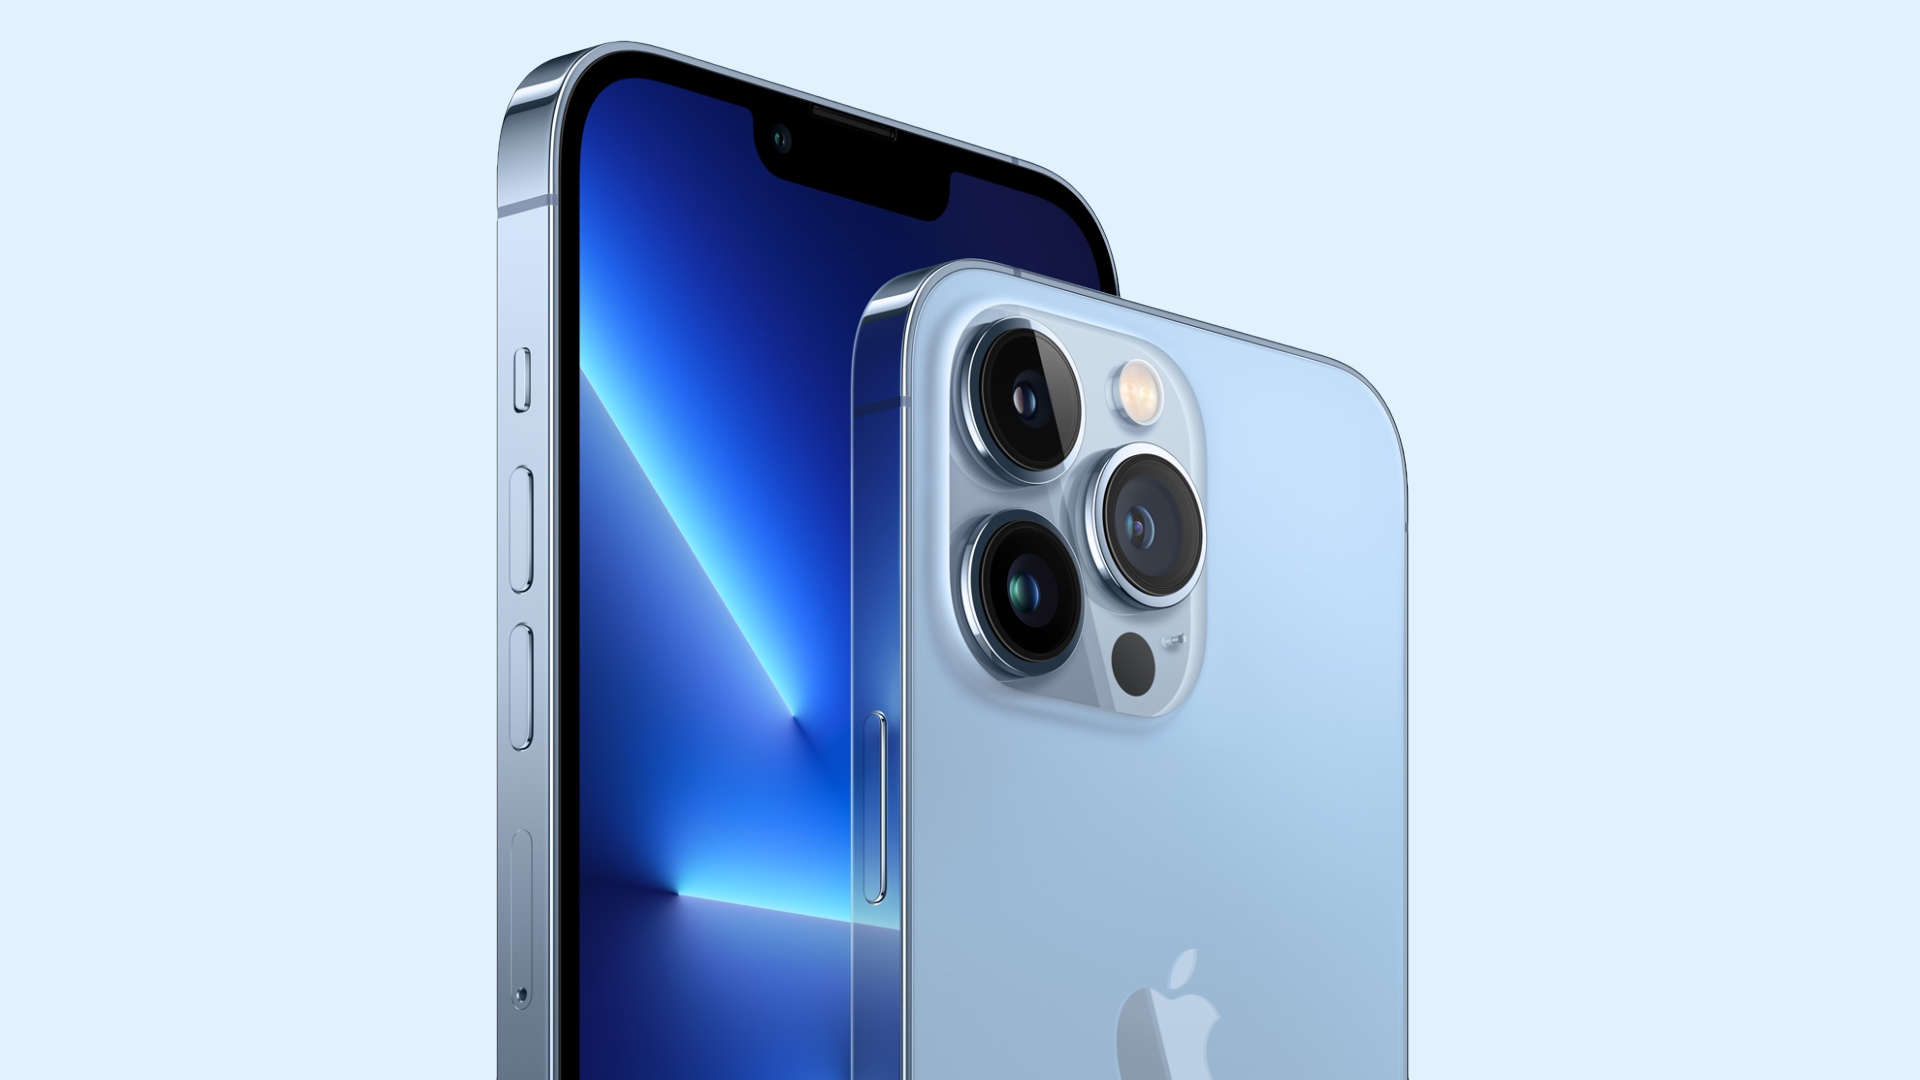 iphone-13-pro-max-tidbits-9to5mac